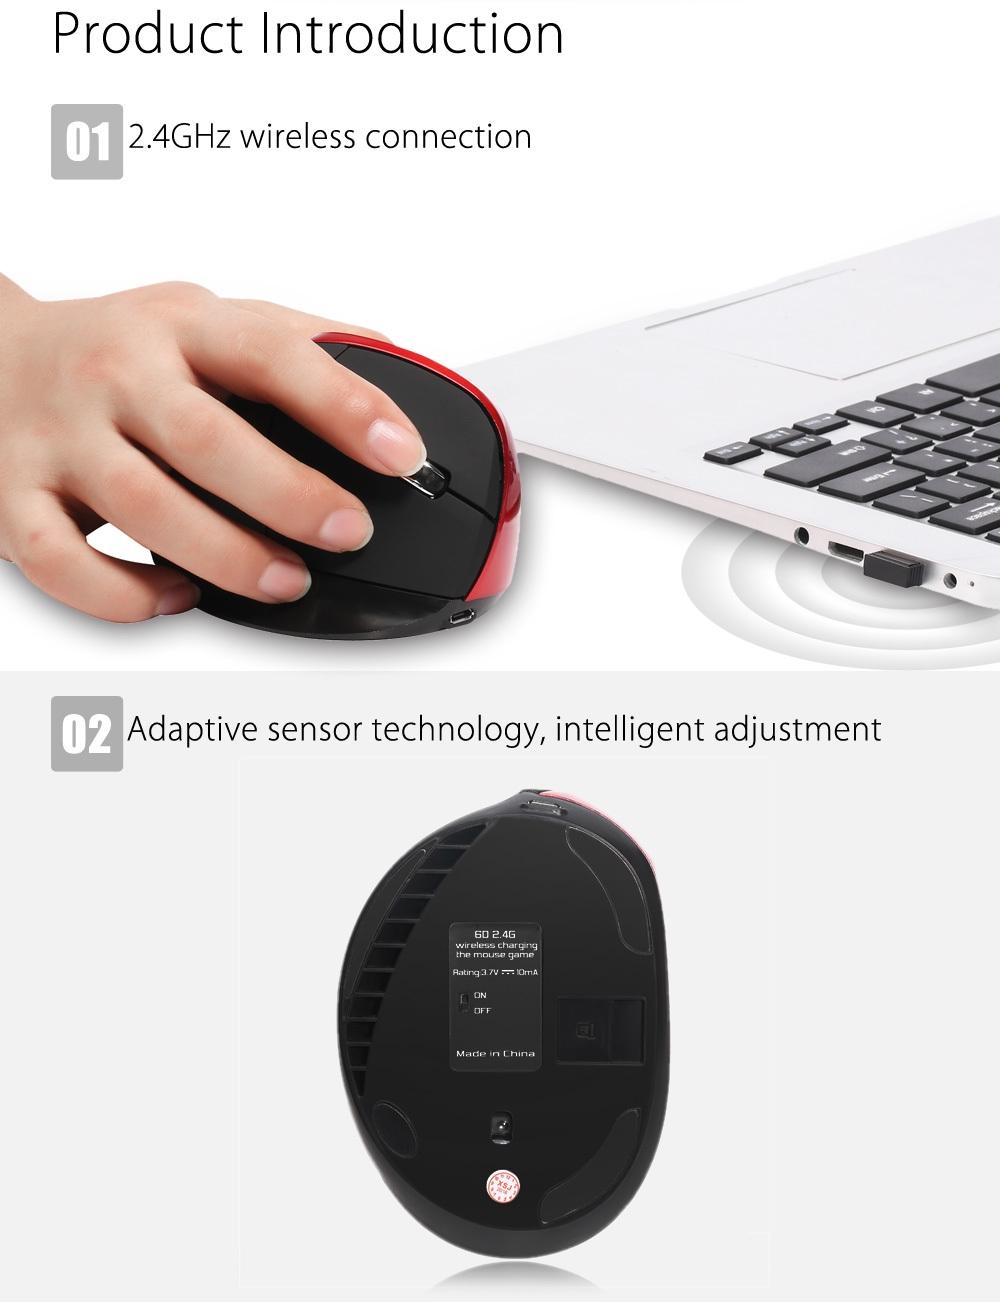 HXSJ X60 6D Wireless Gaming Ergonomic Design Optical Vertical 2400DPI Mouse